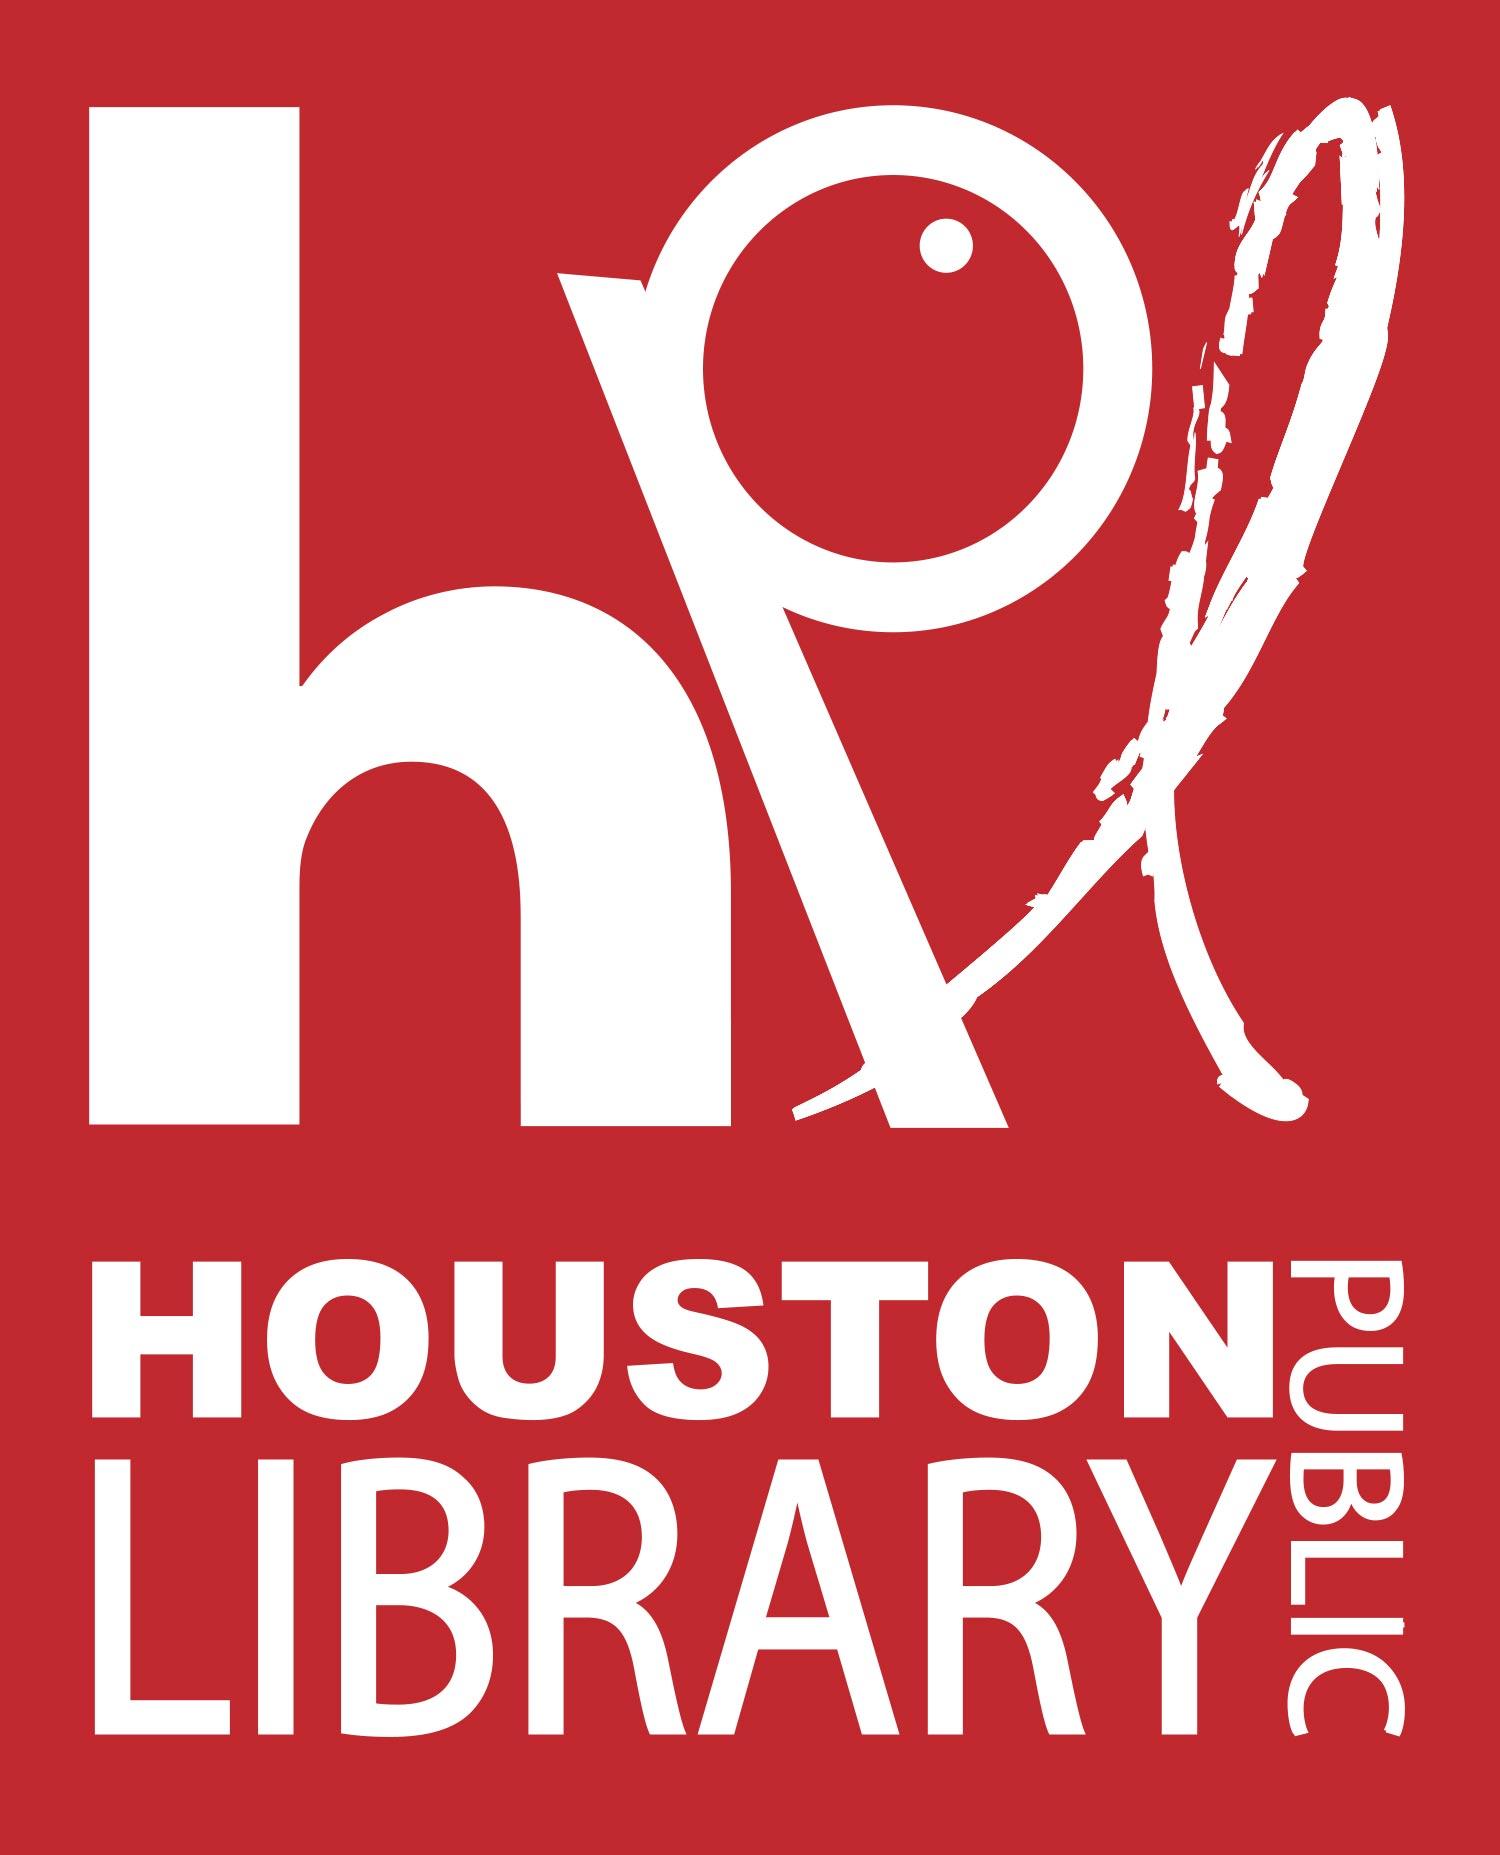 hpl-logo-large.jpg